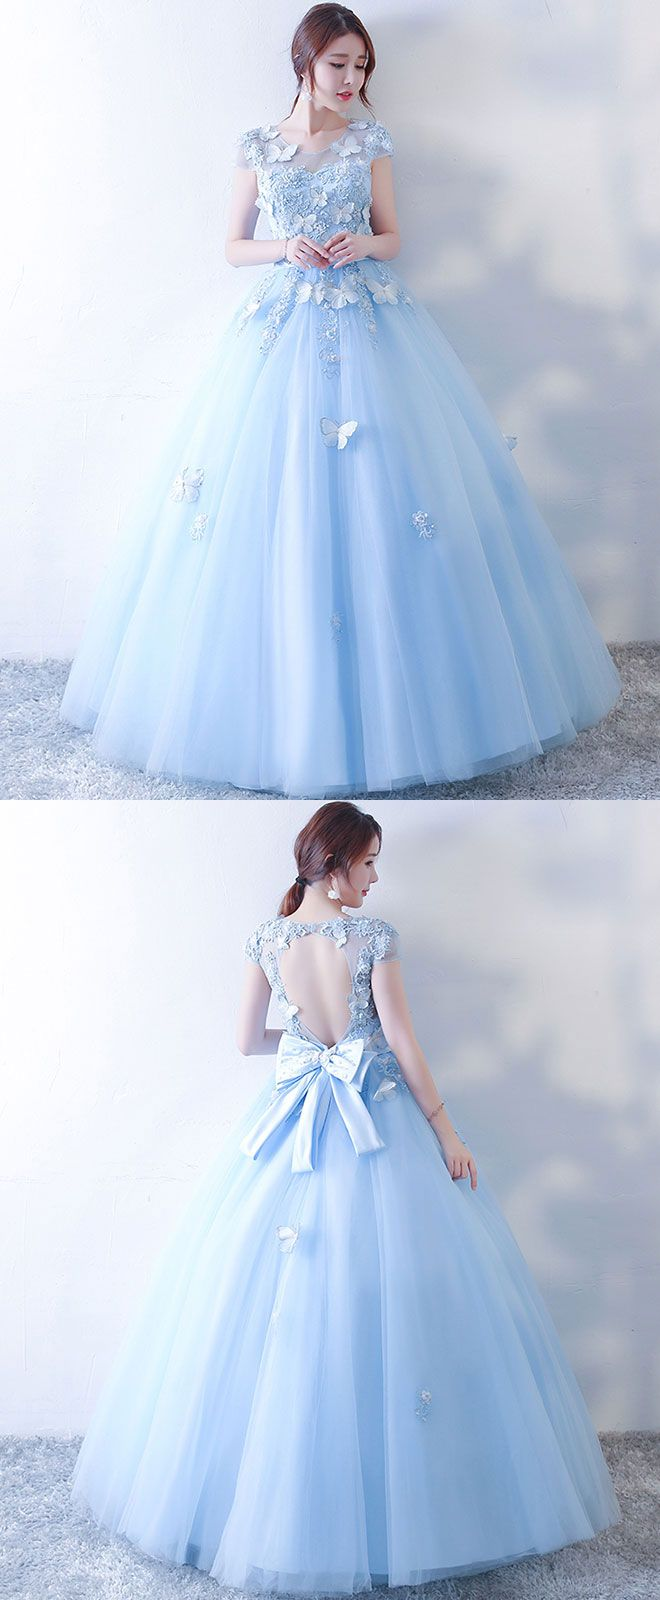 Lace dress bell sleeves june 2019 Blue tulle lace long prom dress blue sweet  dress  yule ball